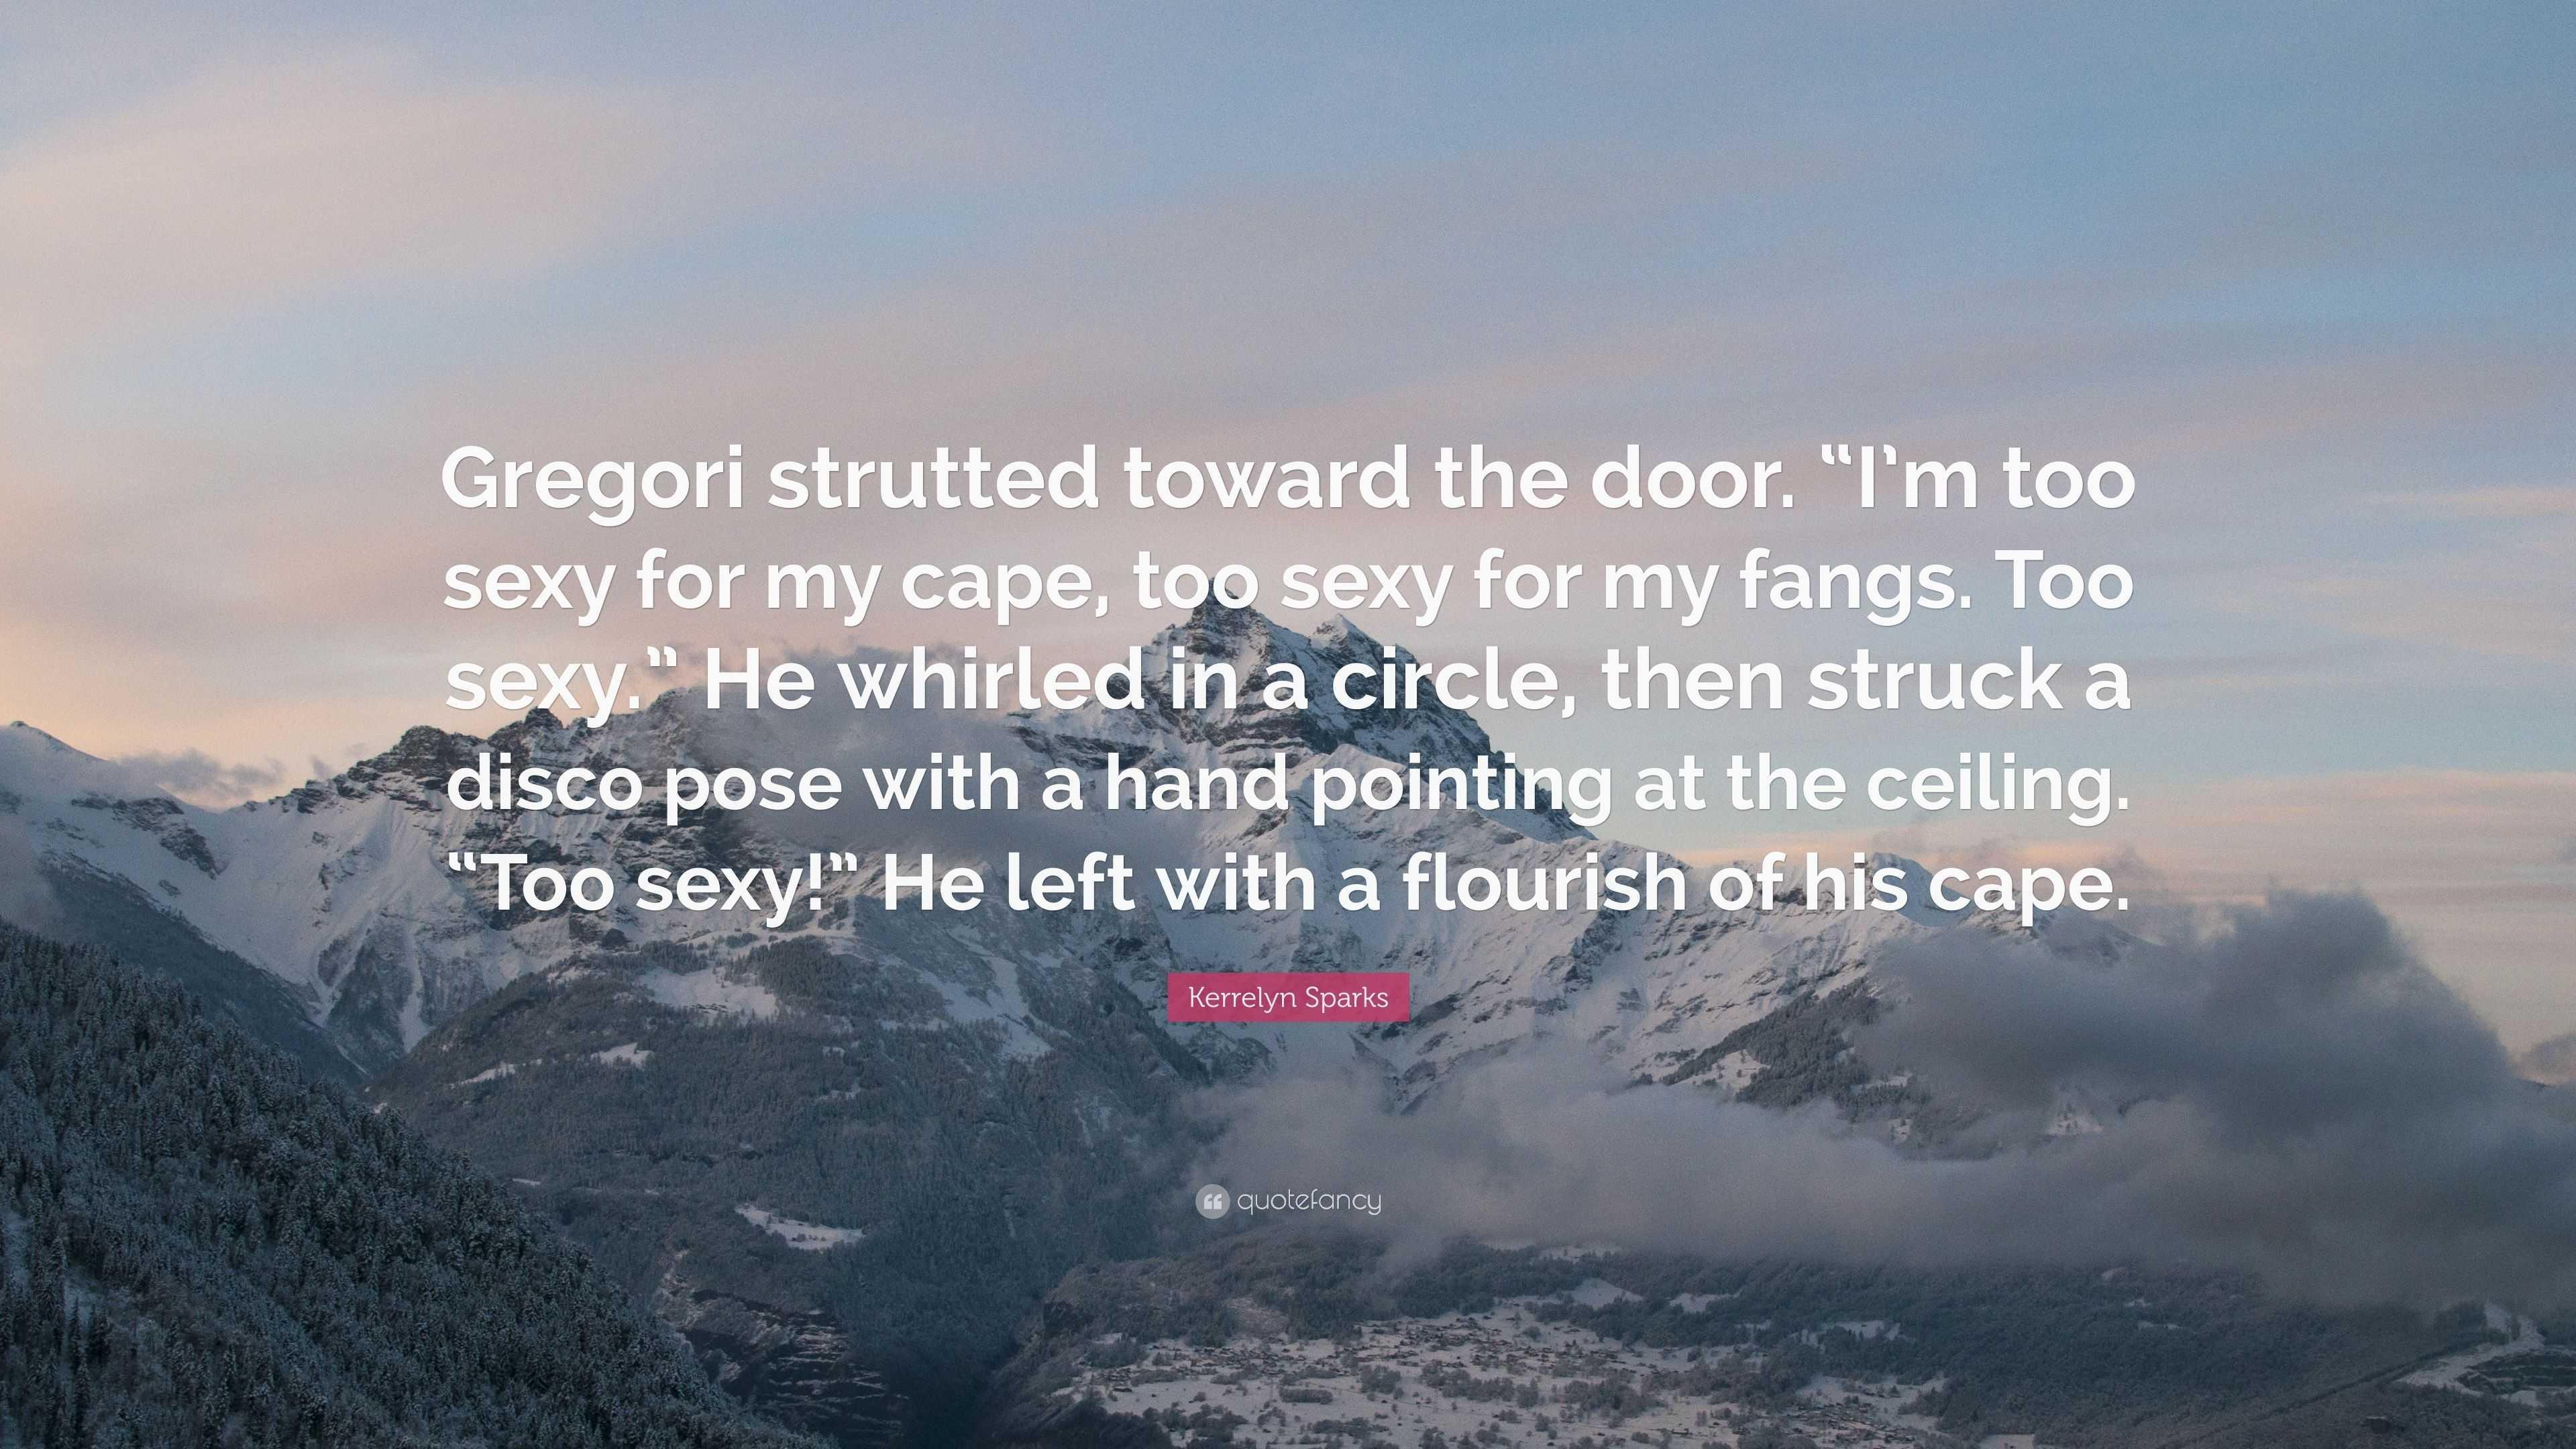 Kerrelyn Sparks Quote \u201cGregori strutted toward the door. \u201cI\u0027m too & Kerrelyn Sparks Quote: \u201cGregori strutted toward the door. \u201cI\u0027m too ...